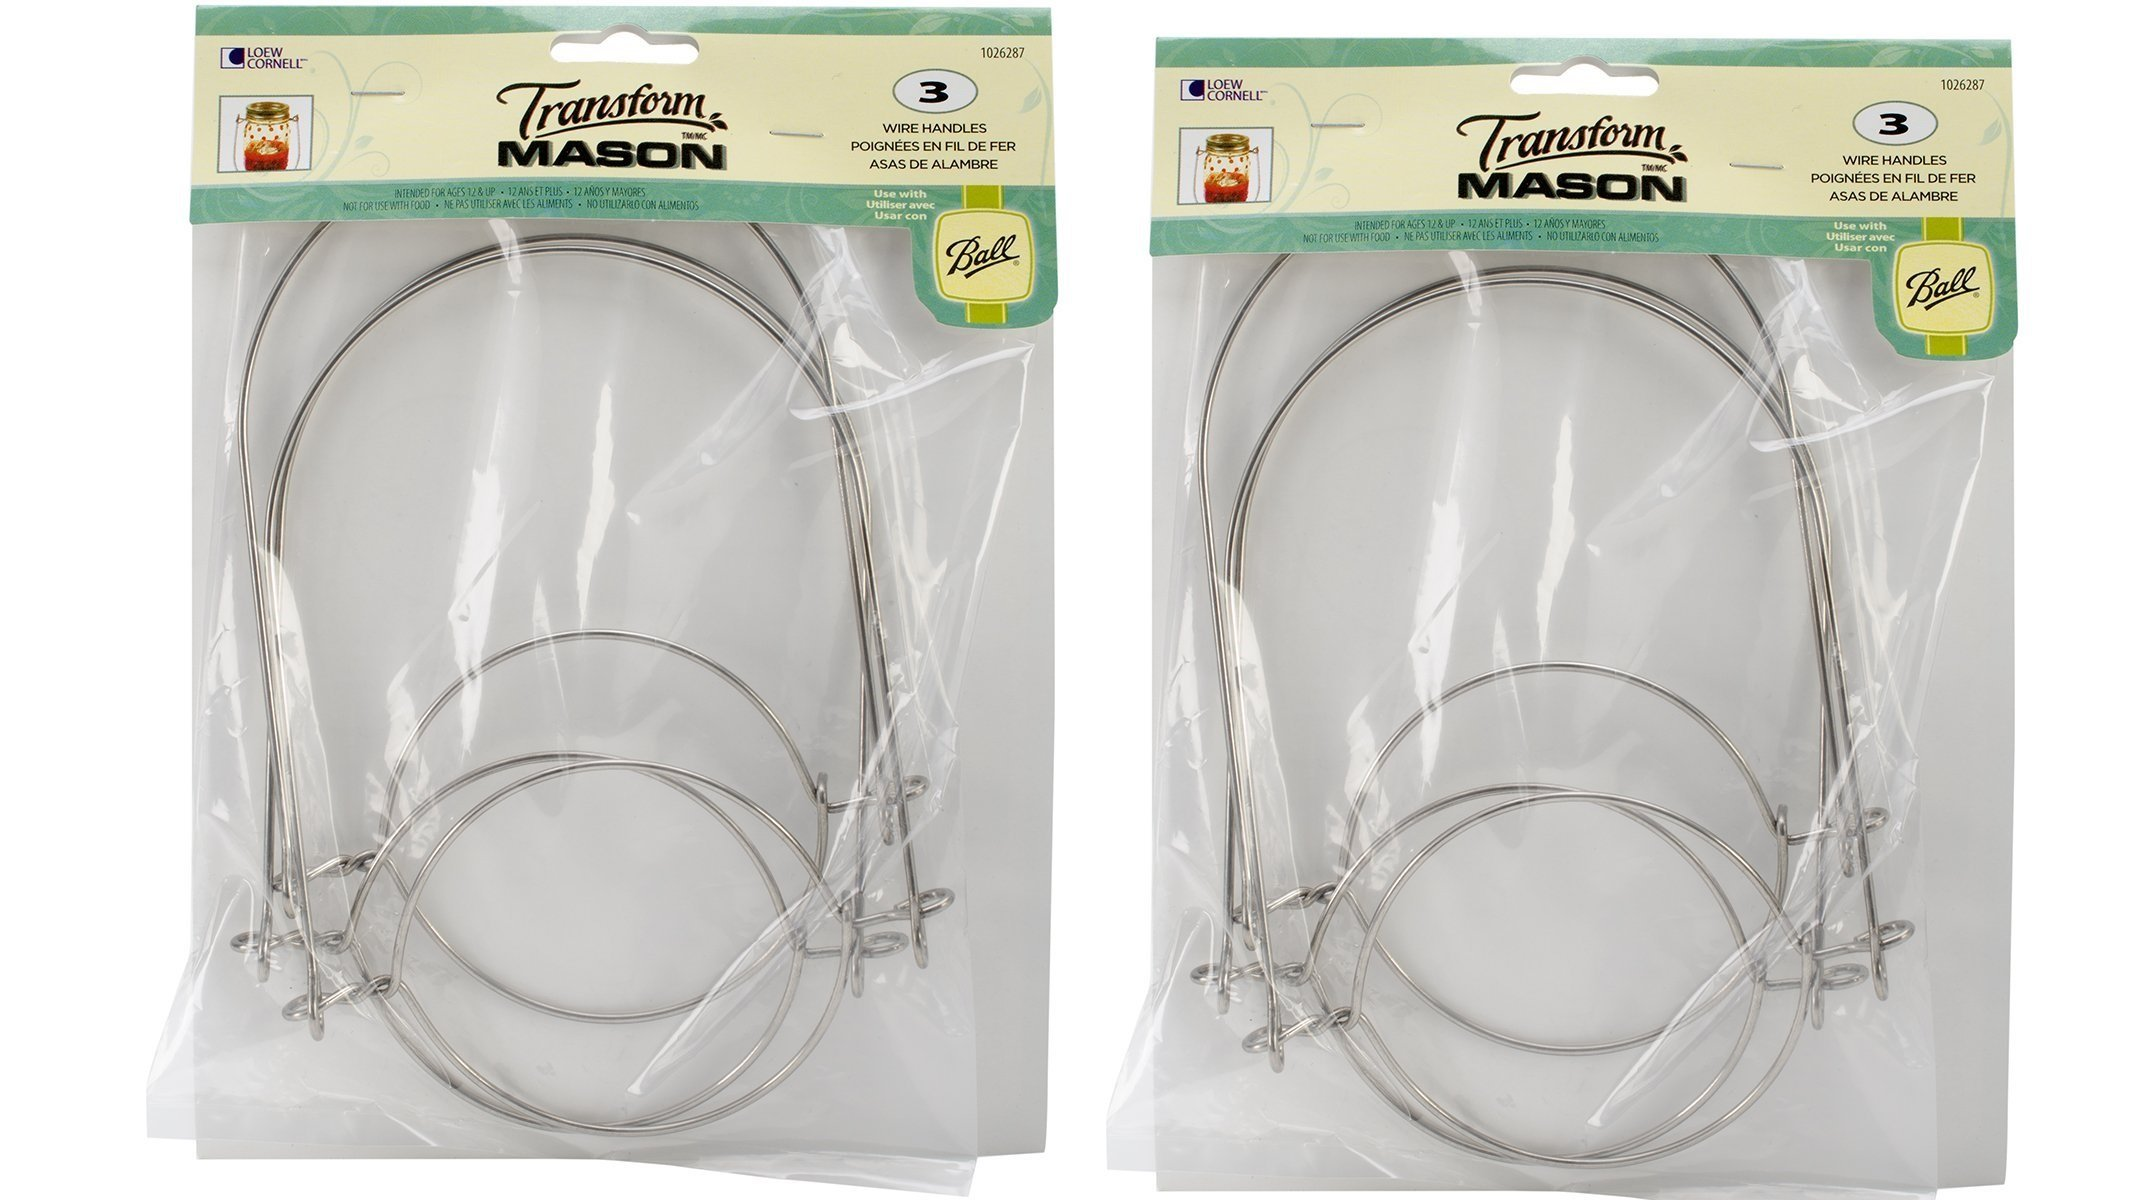 Loew-Cornell Mason Ball Jar Wire Handles (Handle-Ease), 2 - 3-Packs (Total 6)